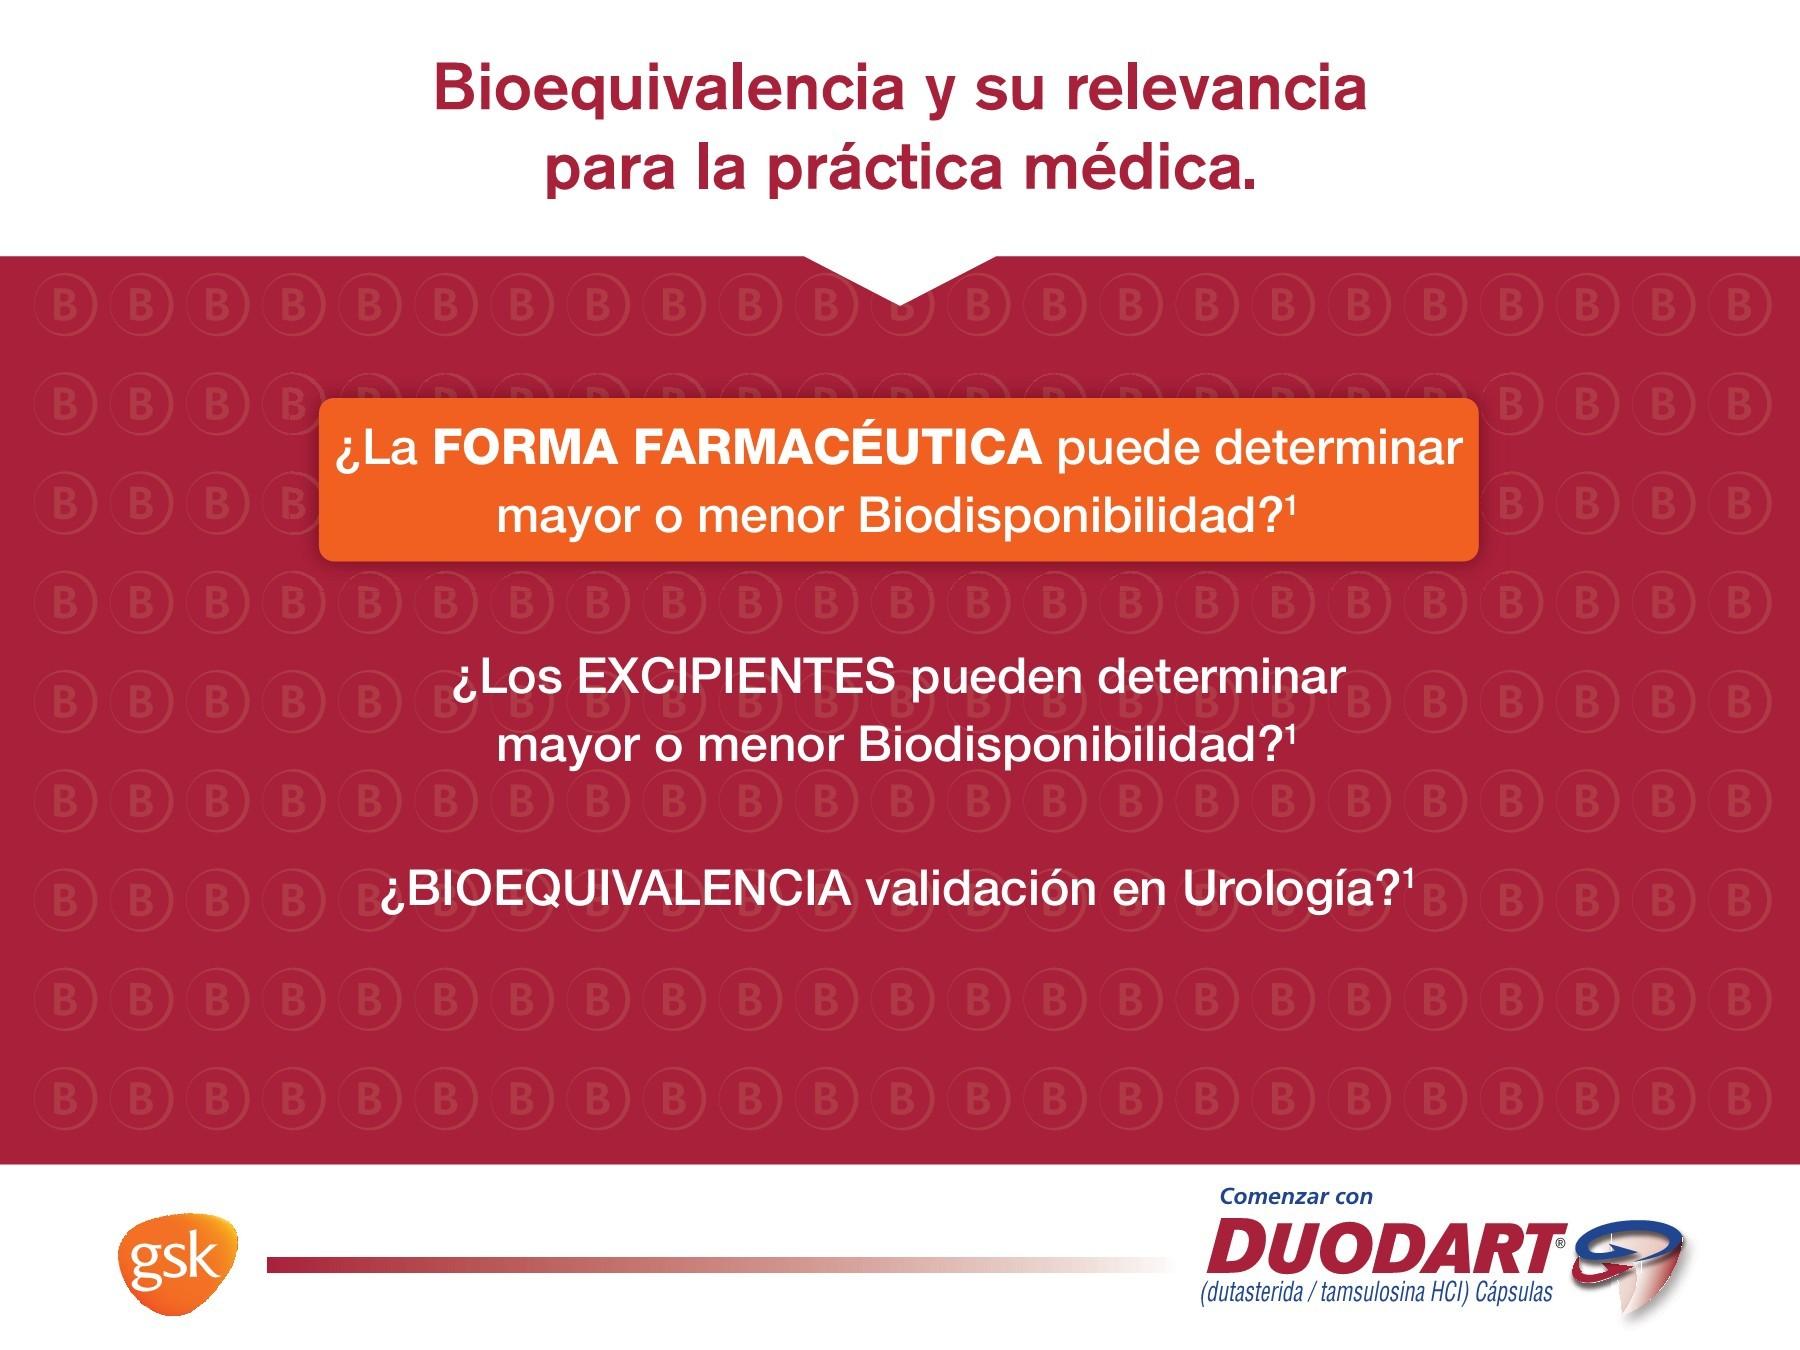 Duodart Bioeq 1 Derbar Flip Pdf Pubhtml5